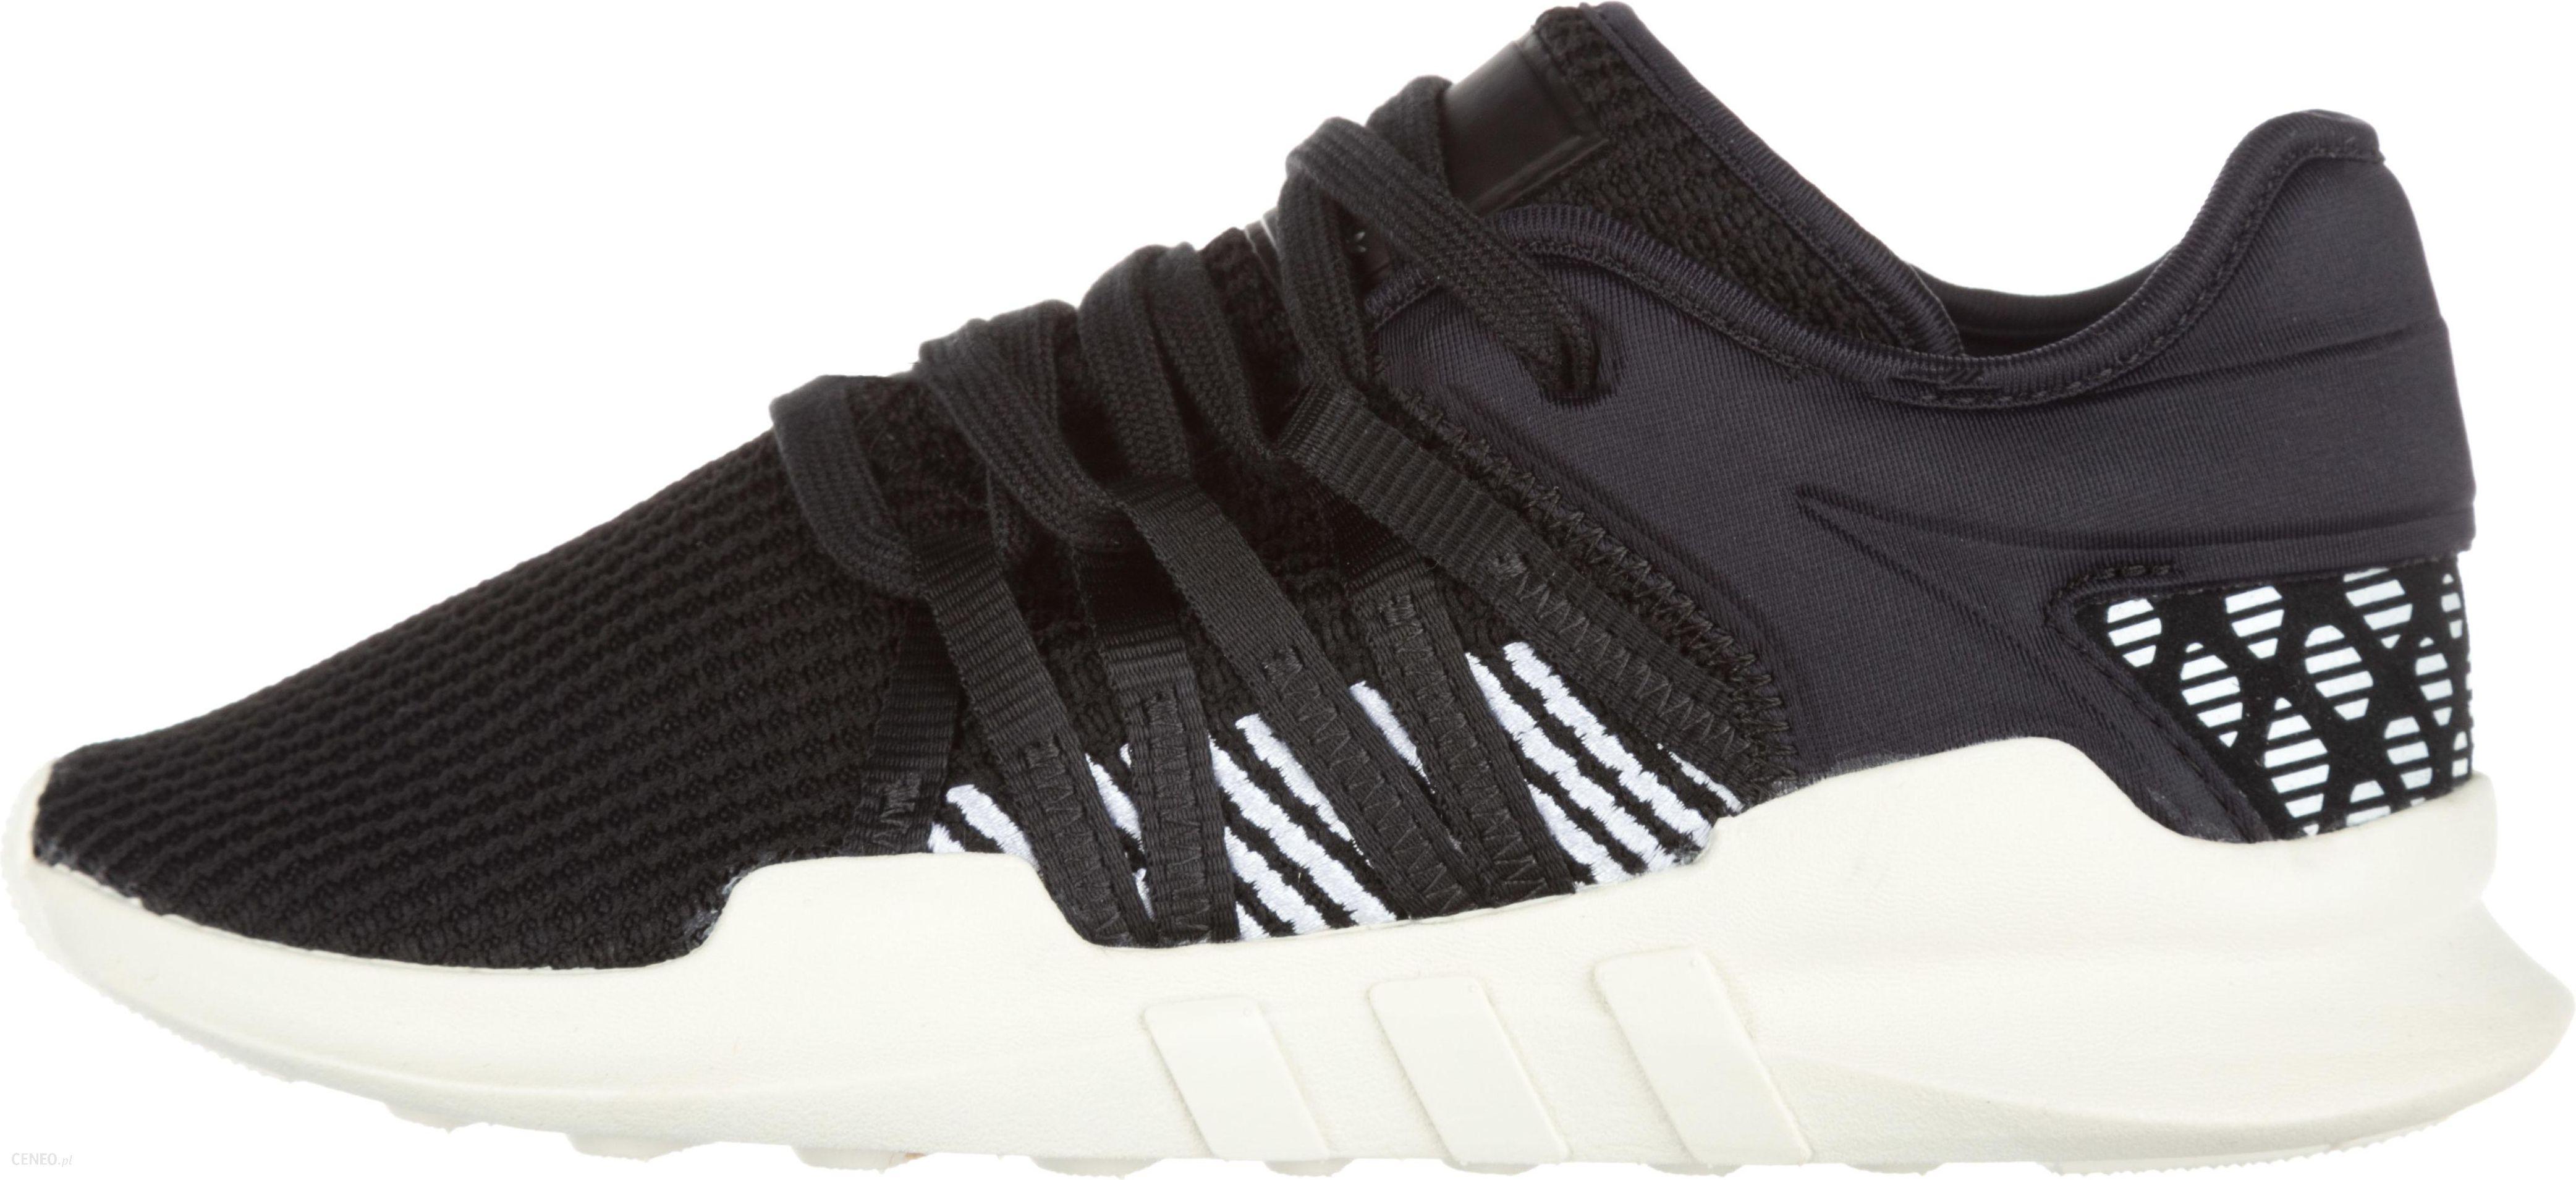 Sneakersy Damskie Adidas Originals Eqt Racing Adv Biały